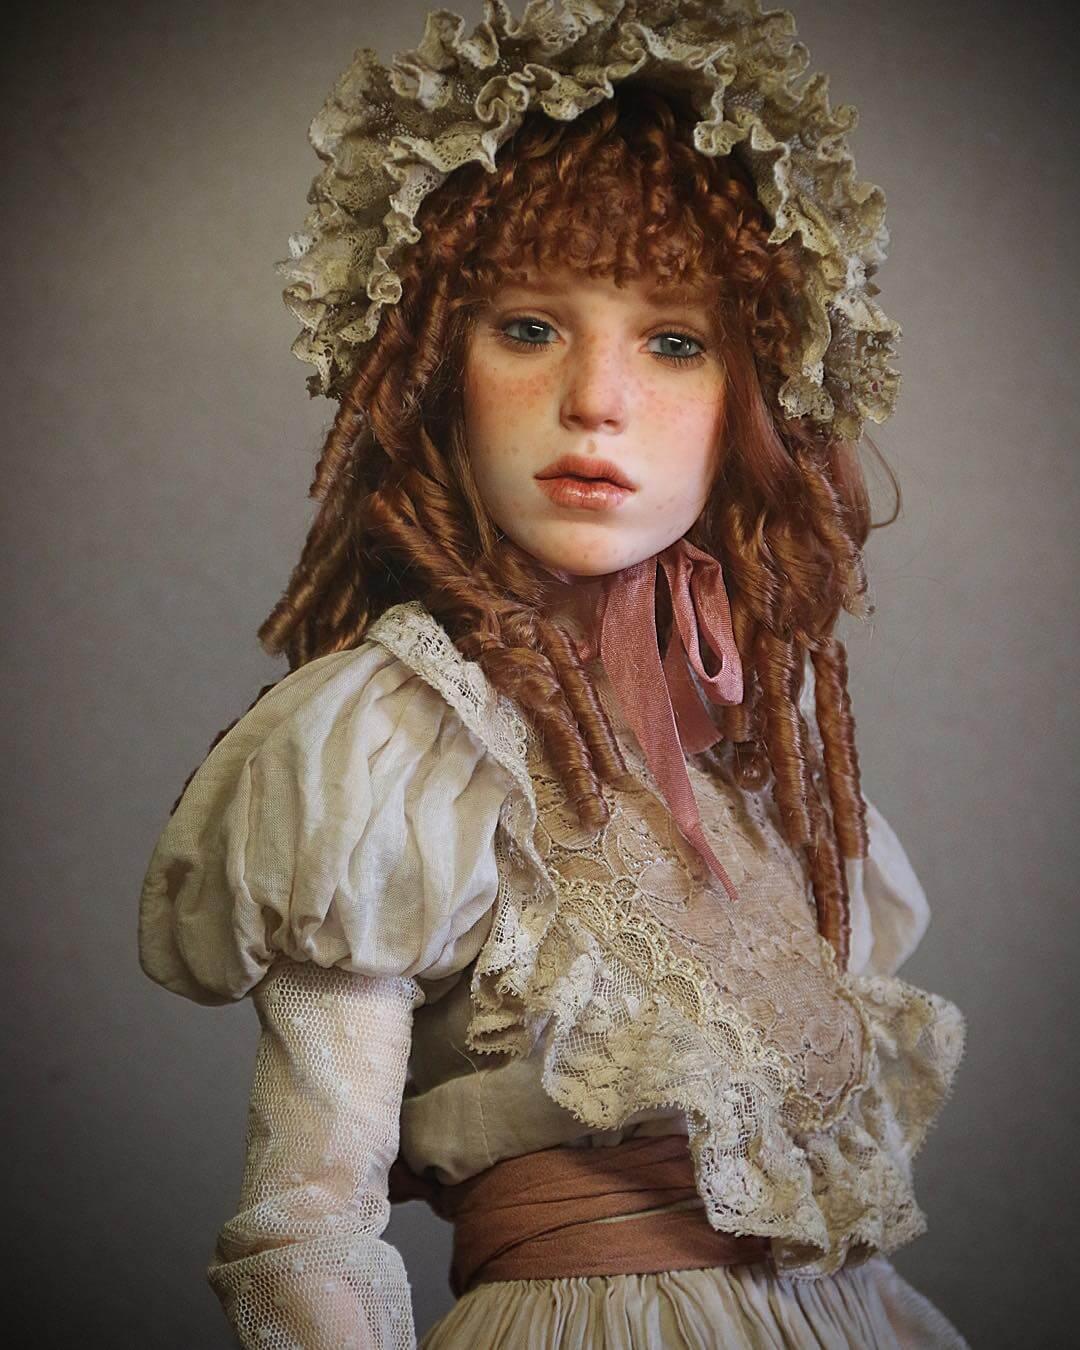 hyper-realistic-dolls-michael-zajkov-fy-15